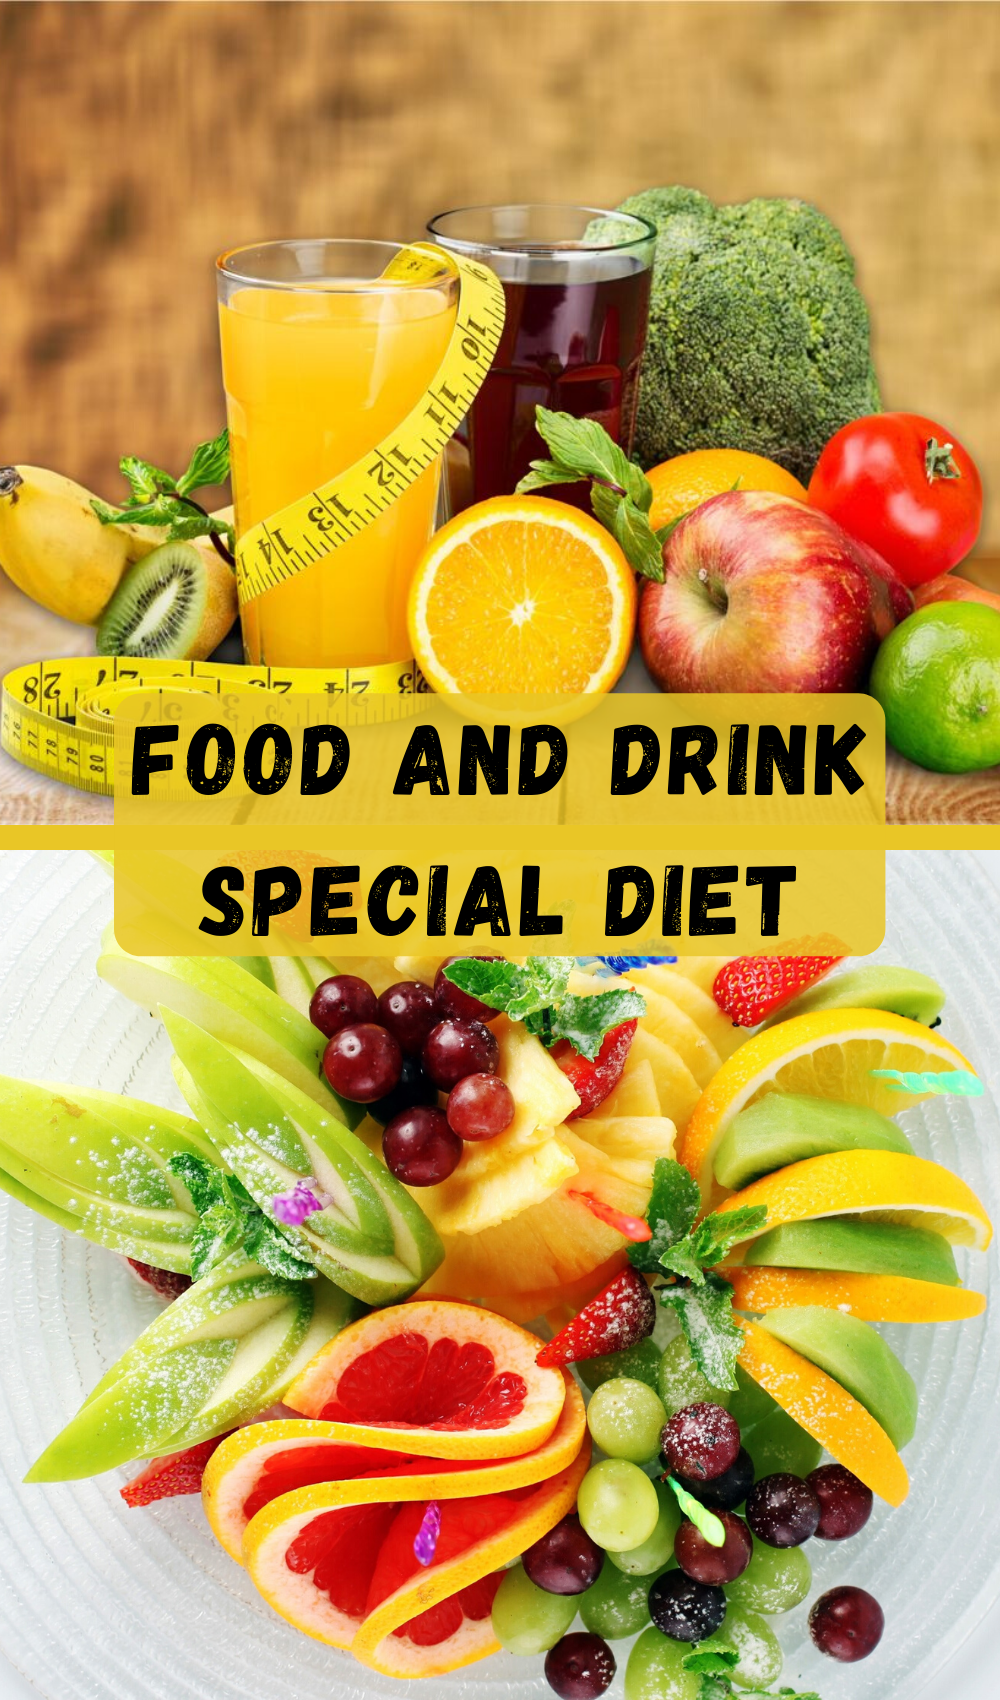 food and drink special diet #food #healtyfood #specialdiet